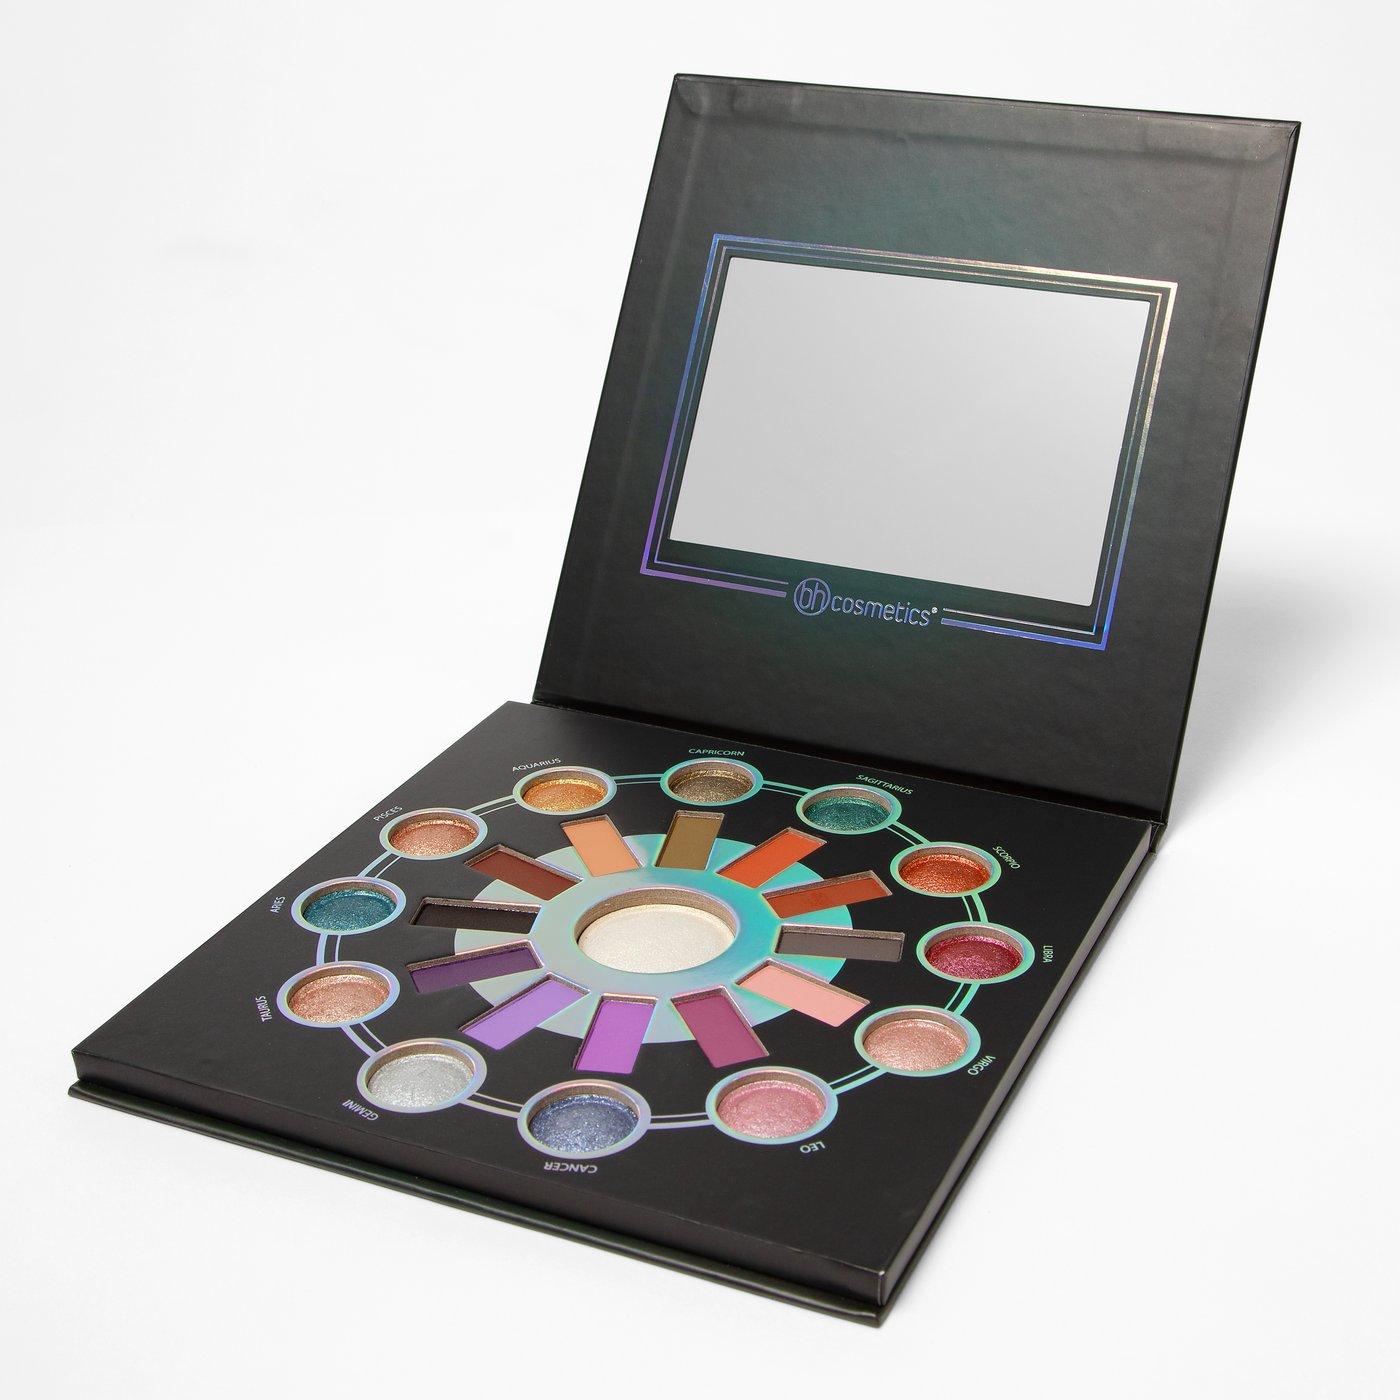 Zodiac_Color_Eyeshadow___Highlighter_Palette.jpg